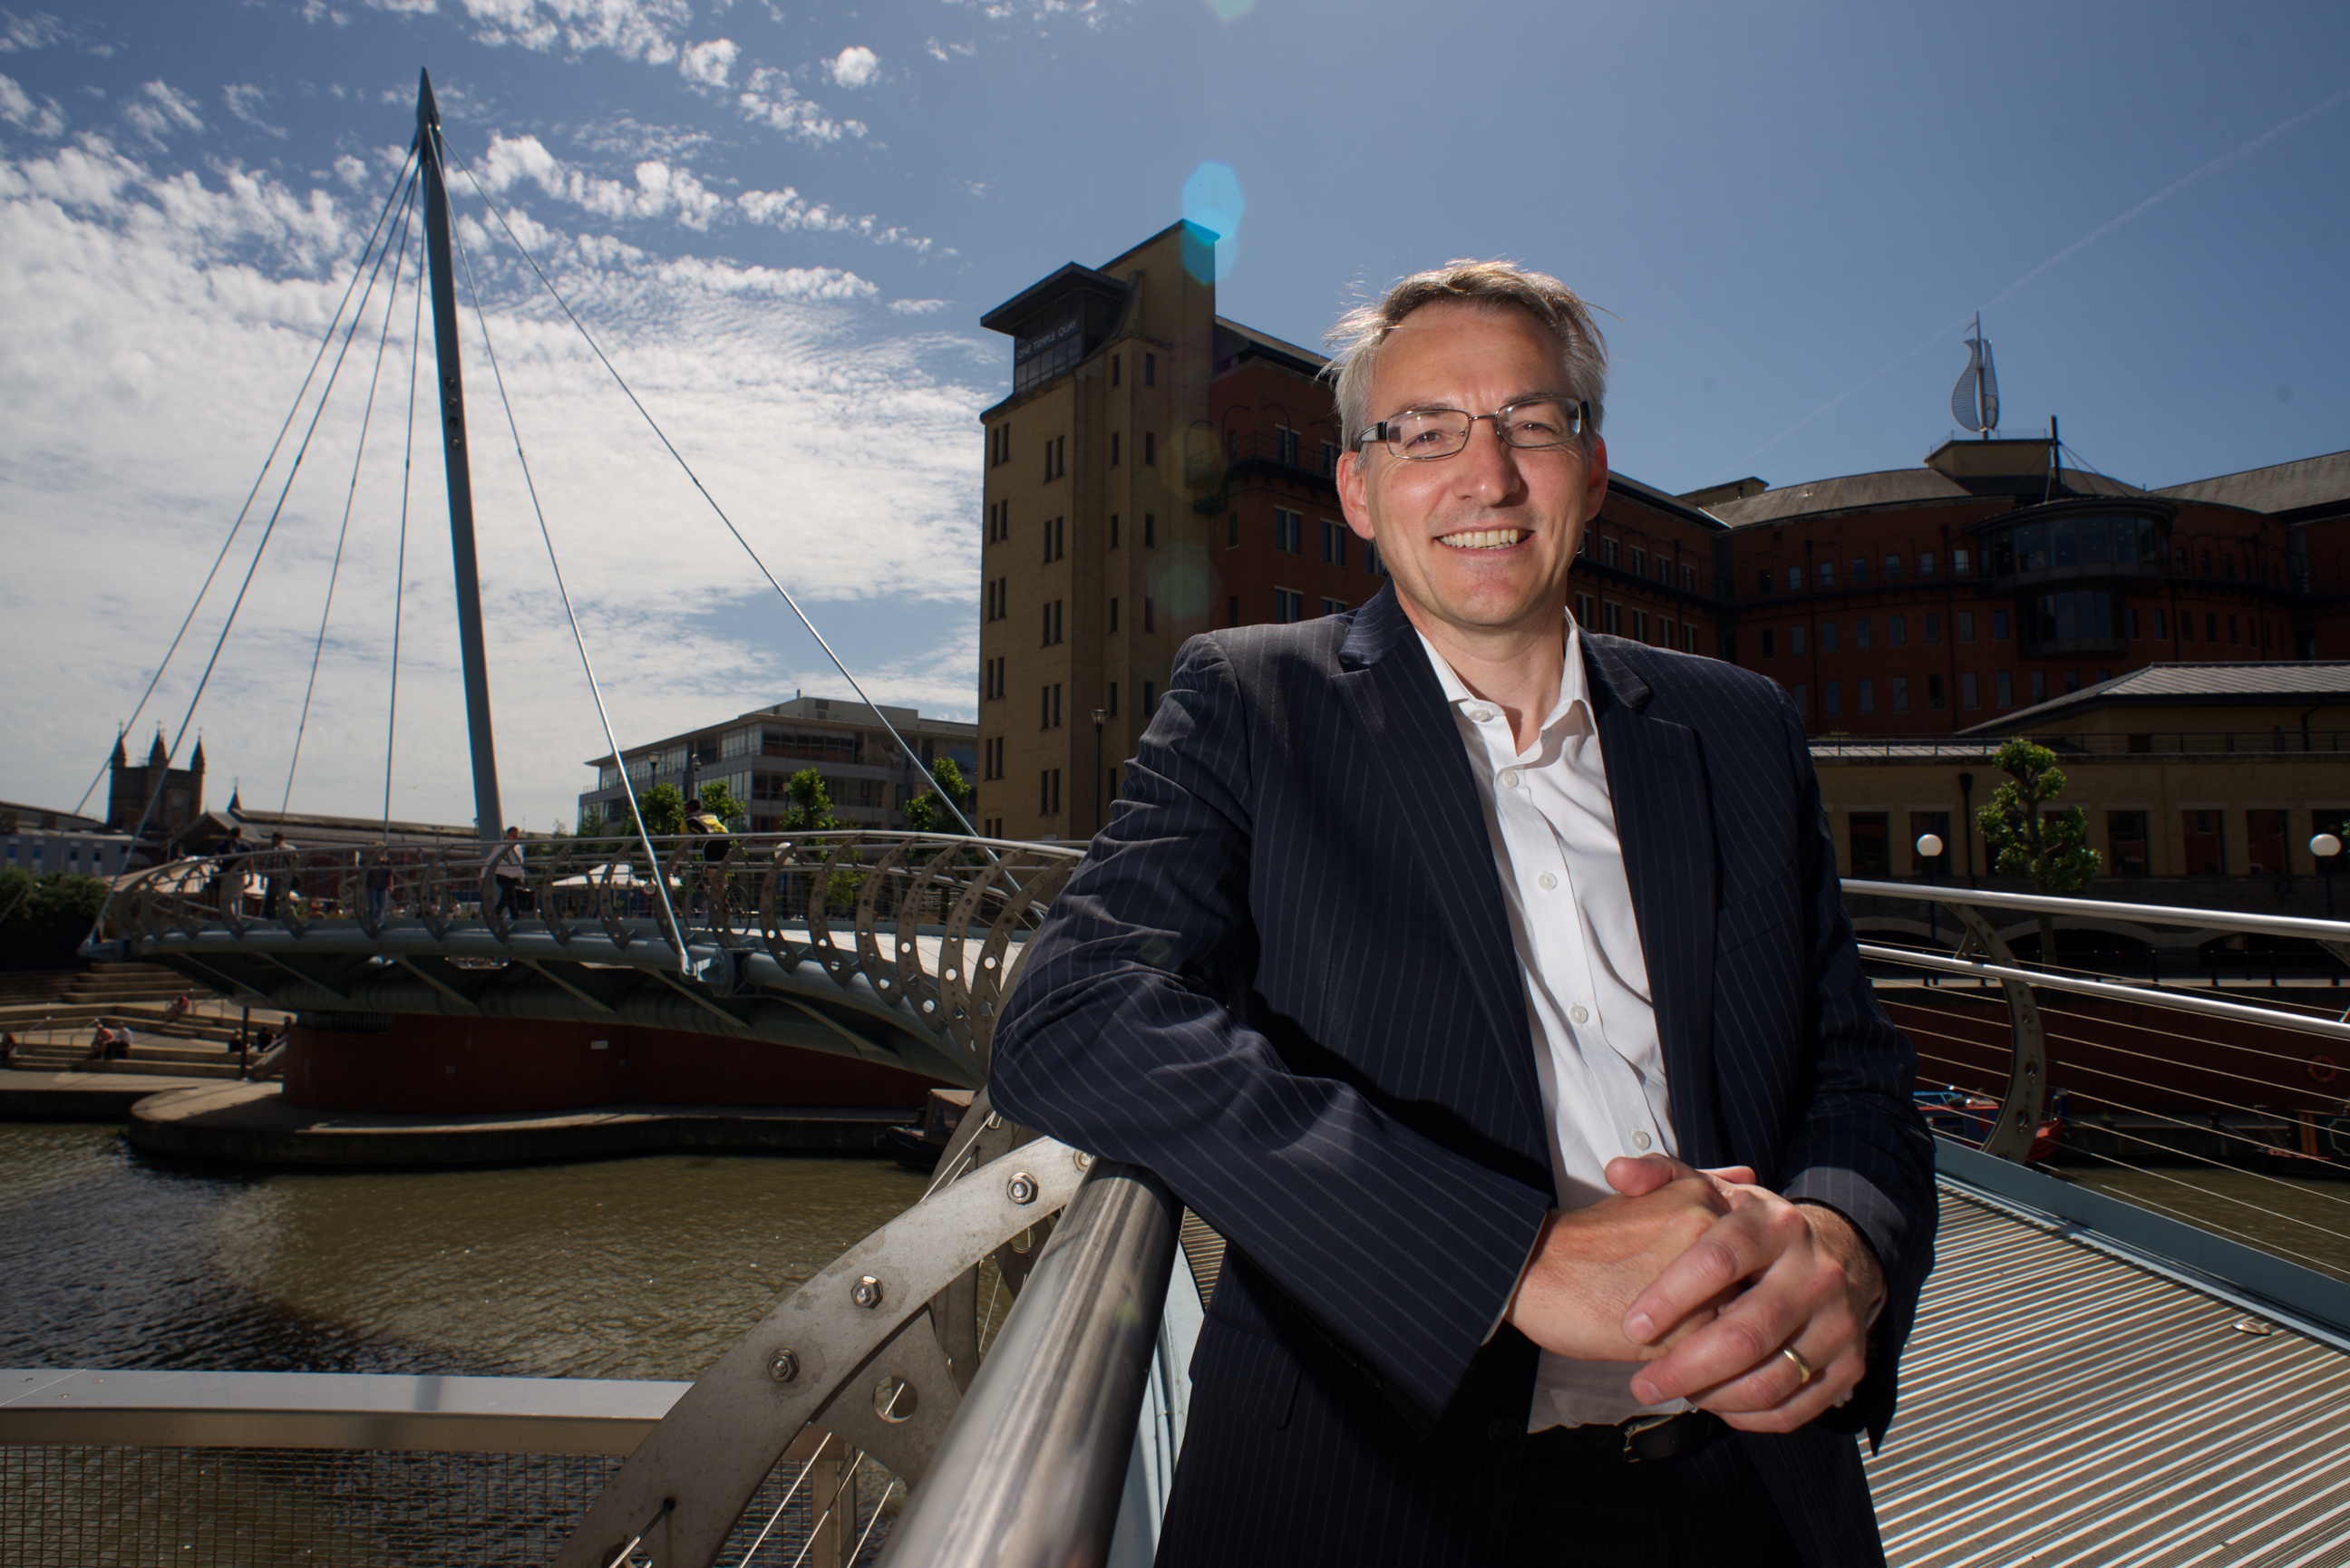 Stuart Pearce, CEO of ESI